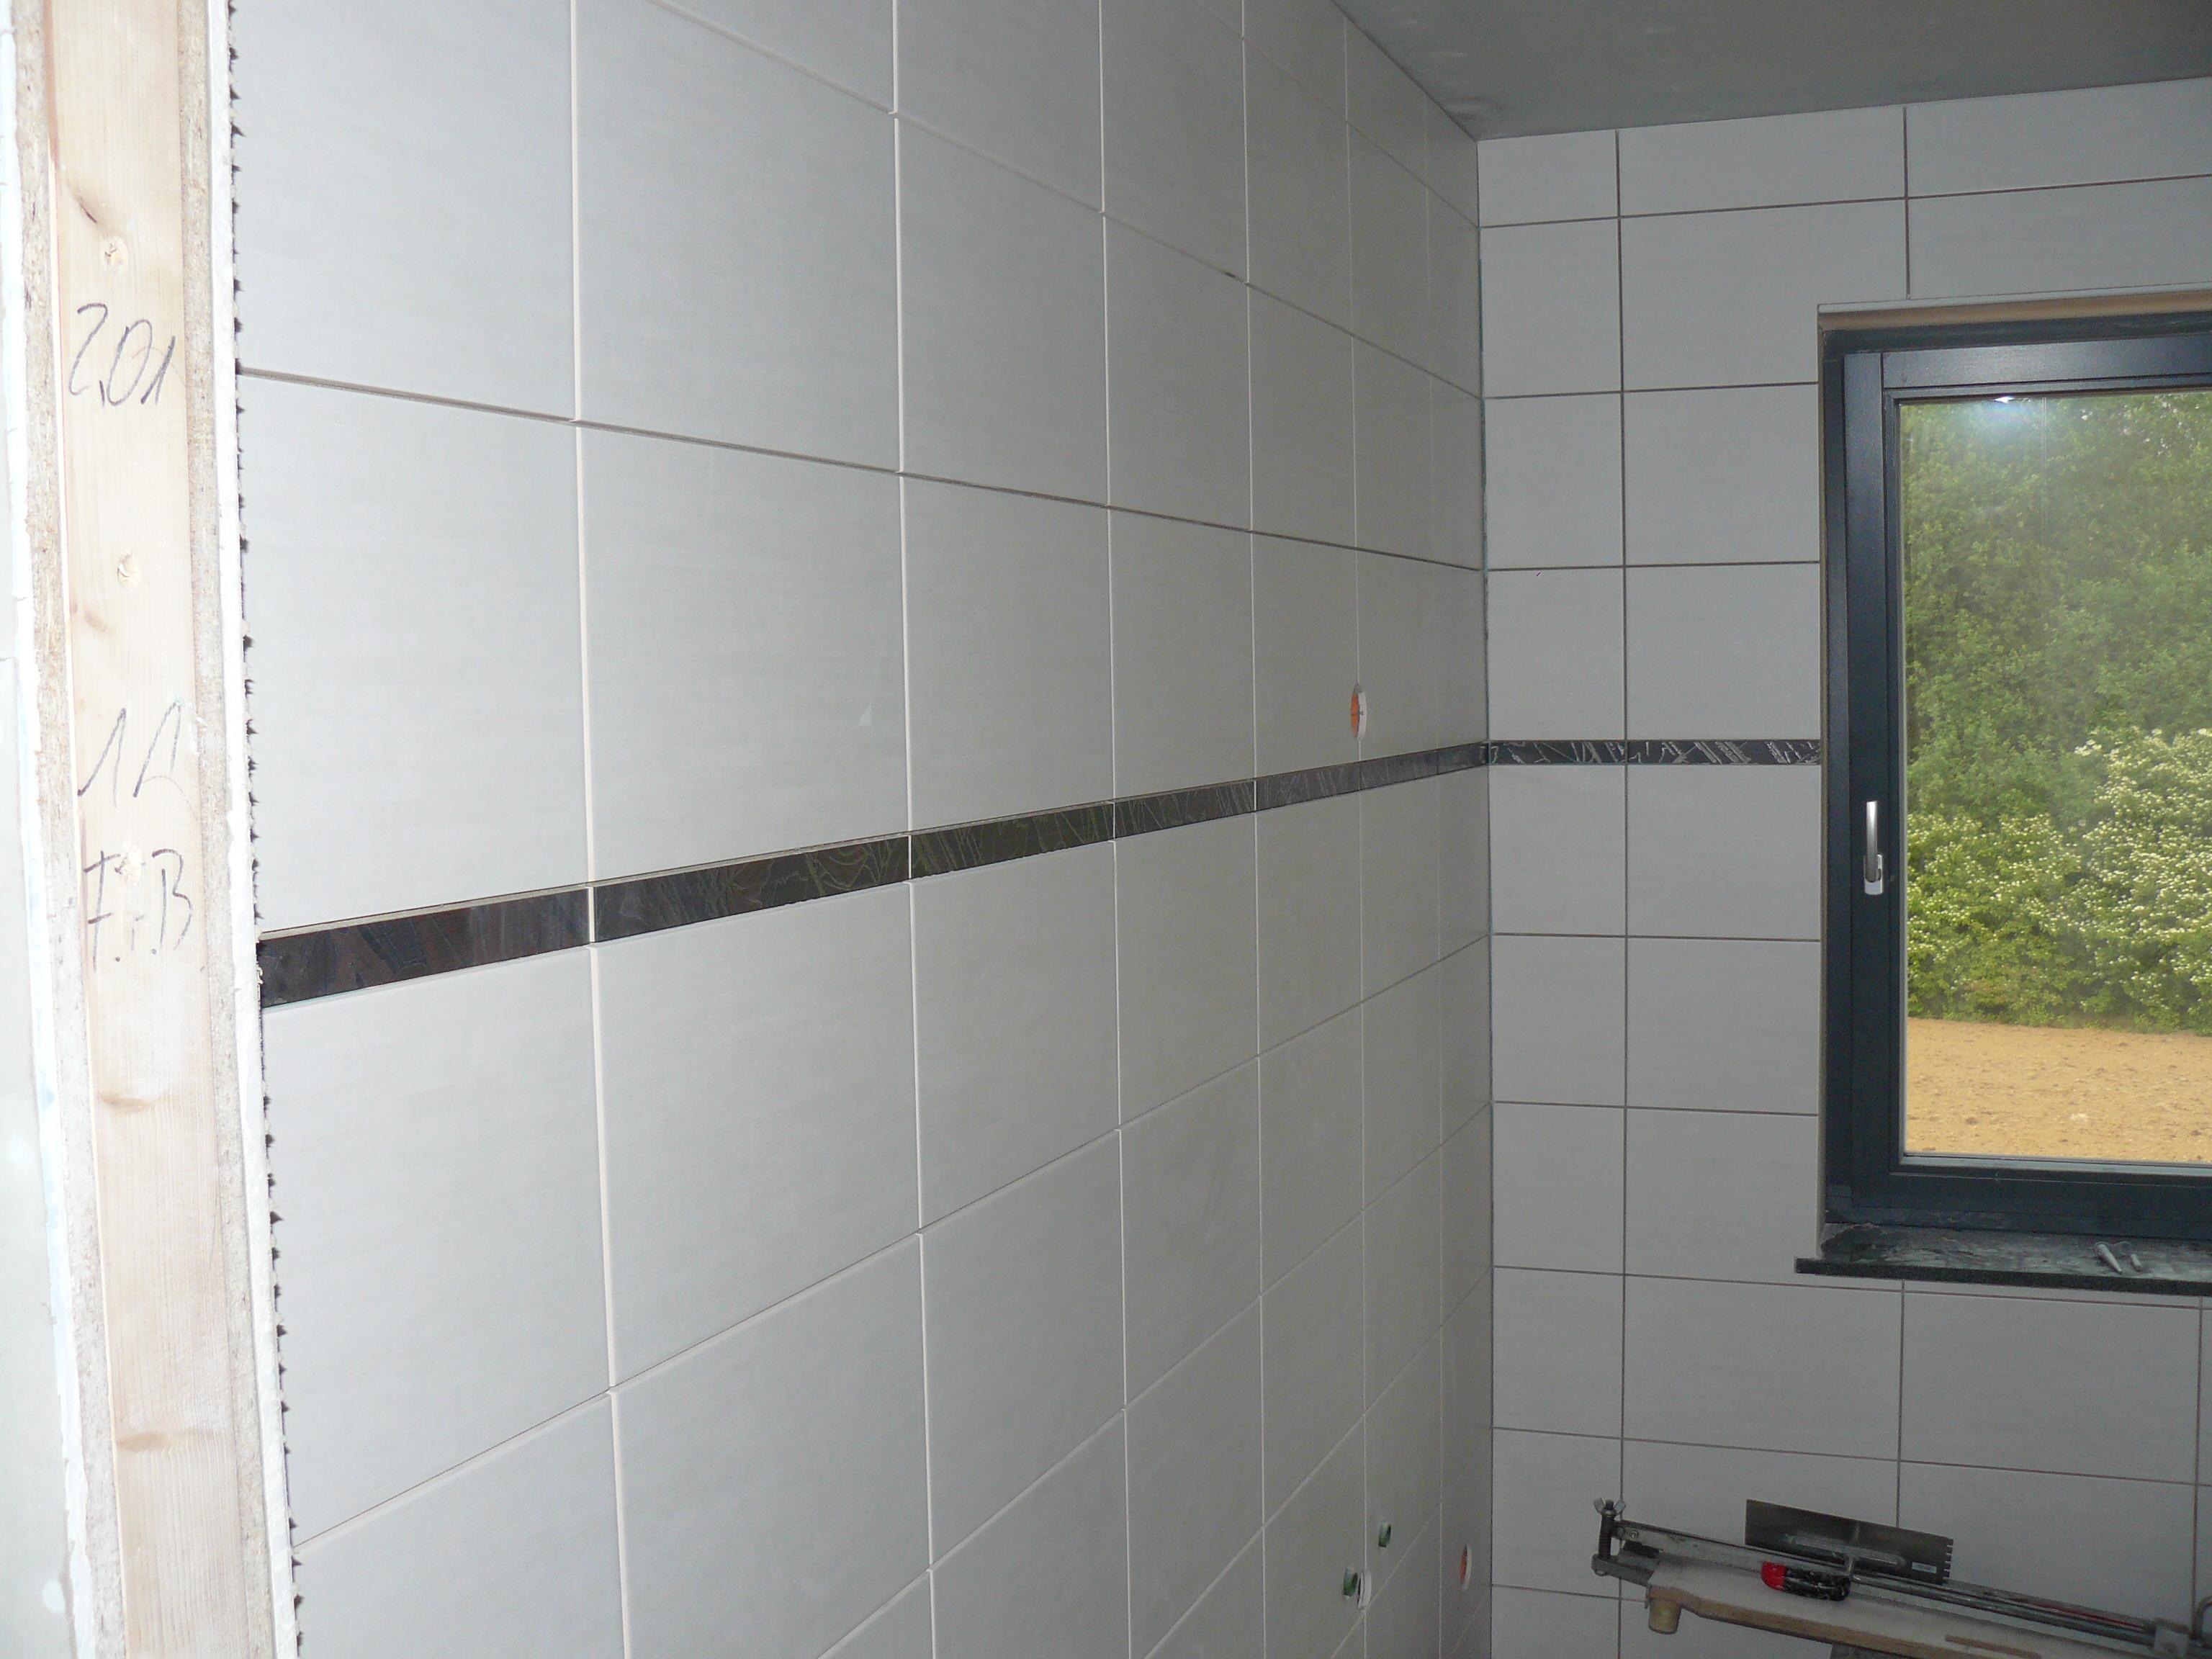 p1130516